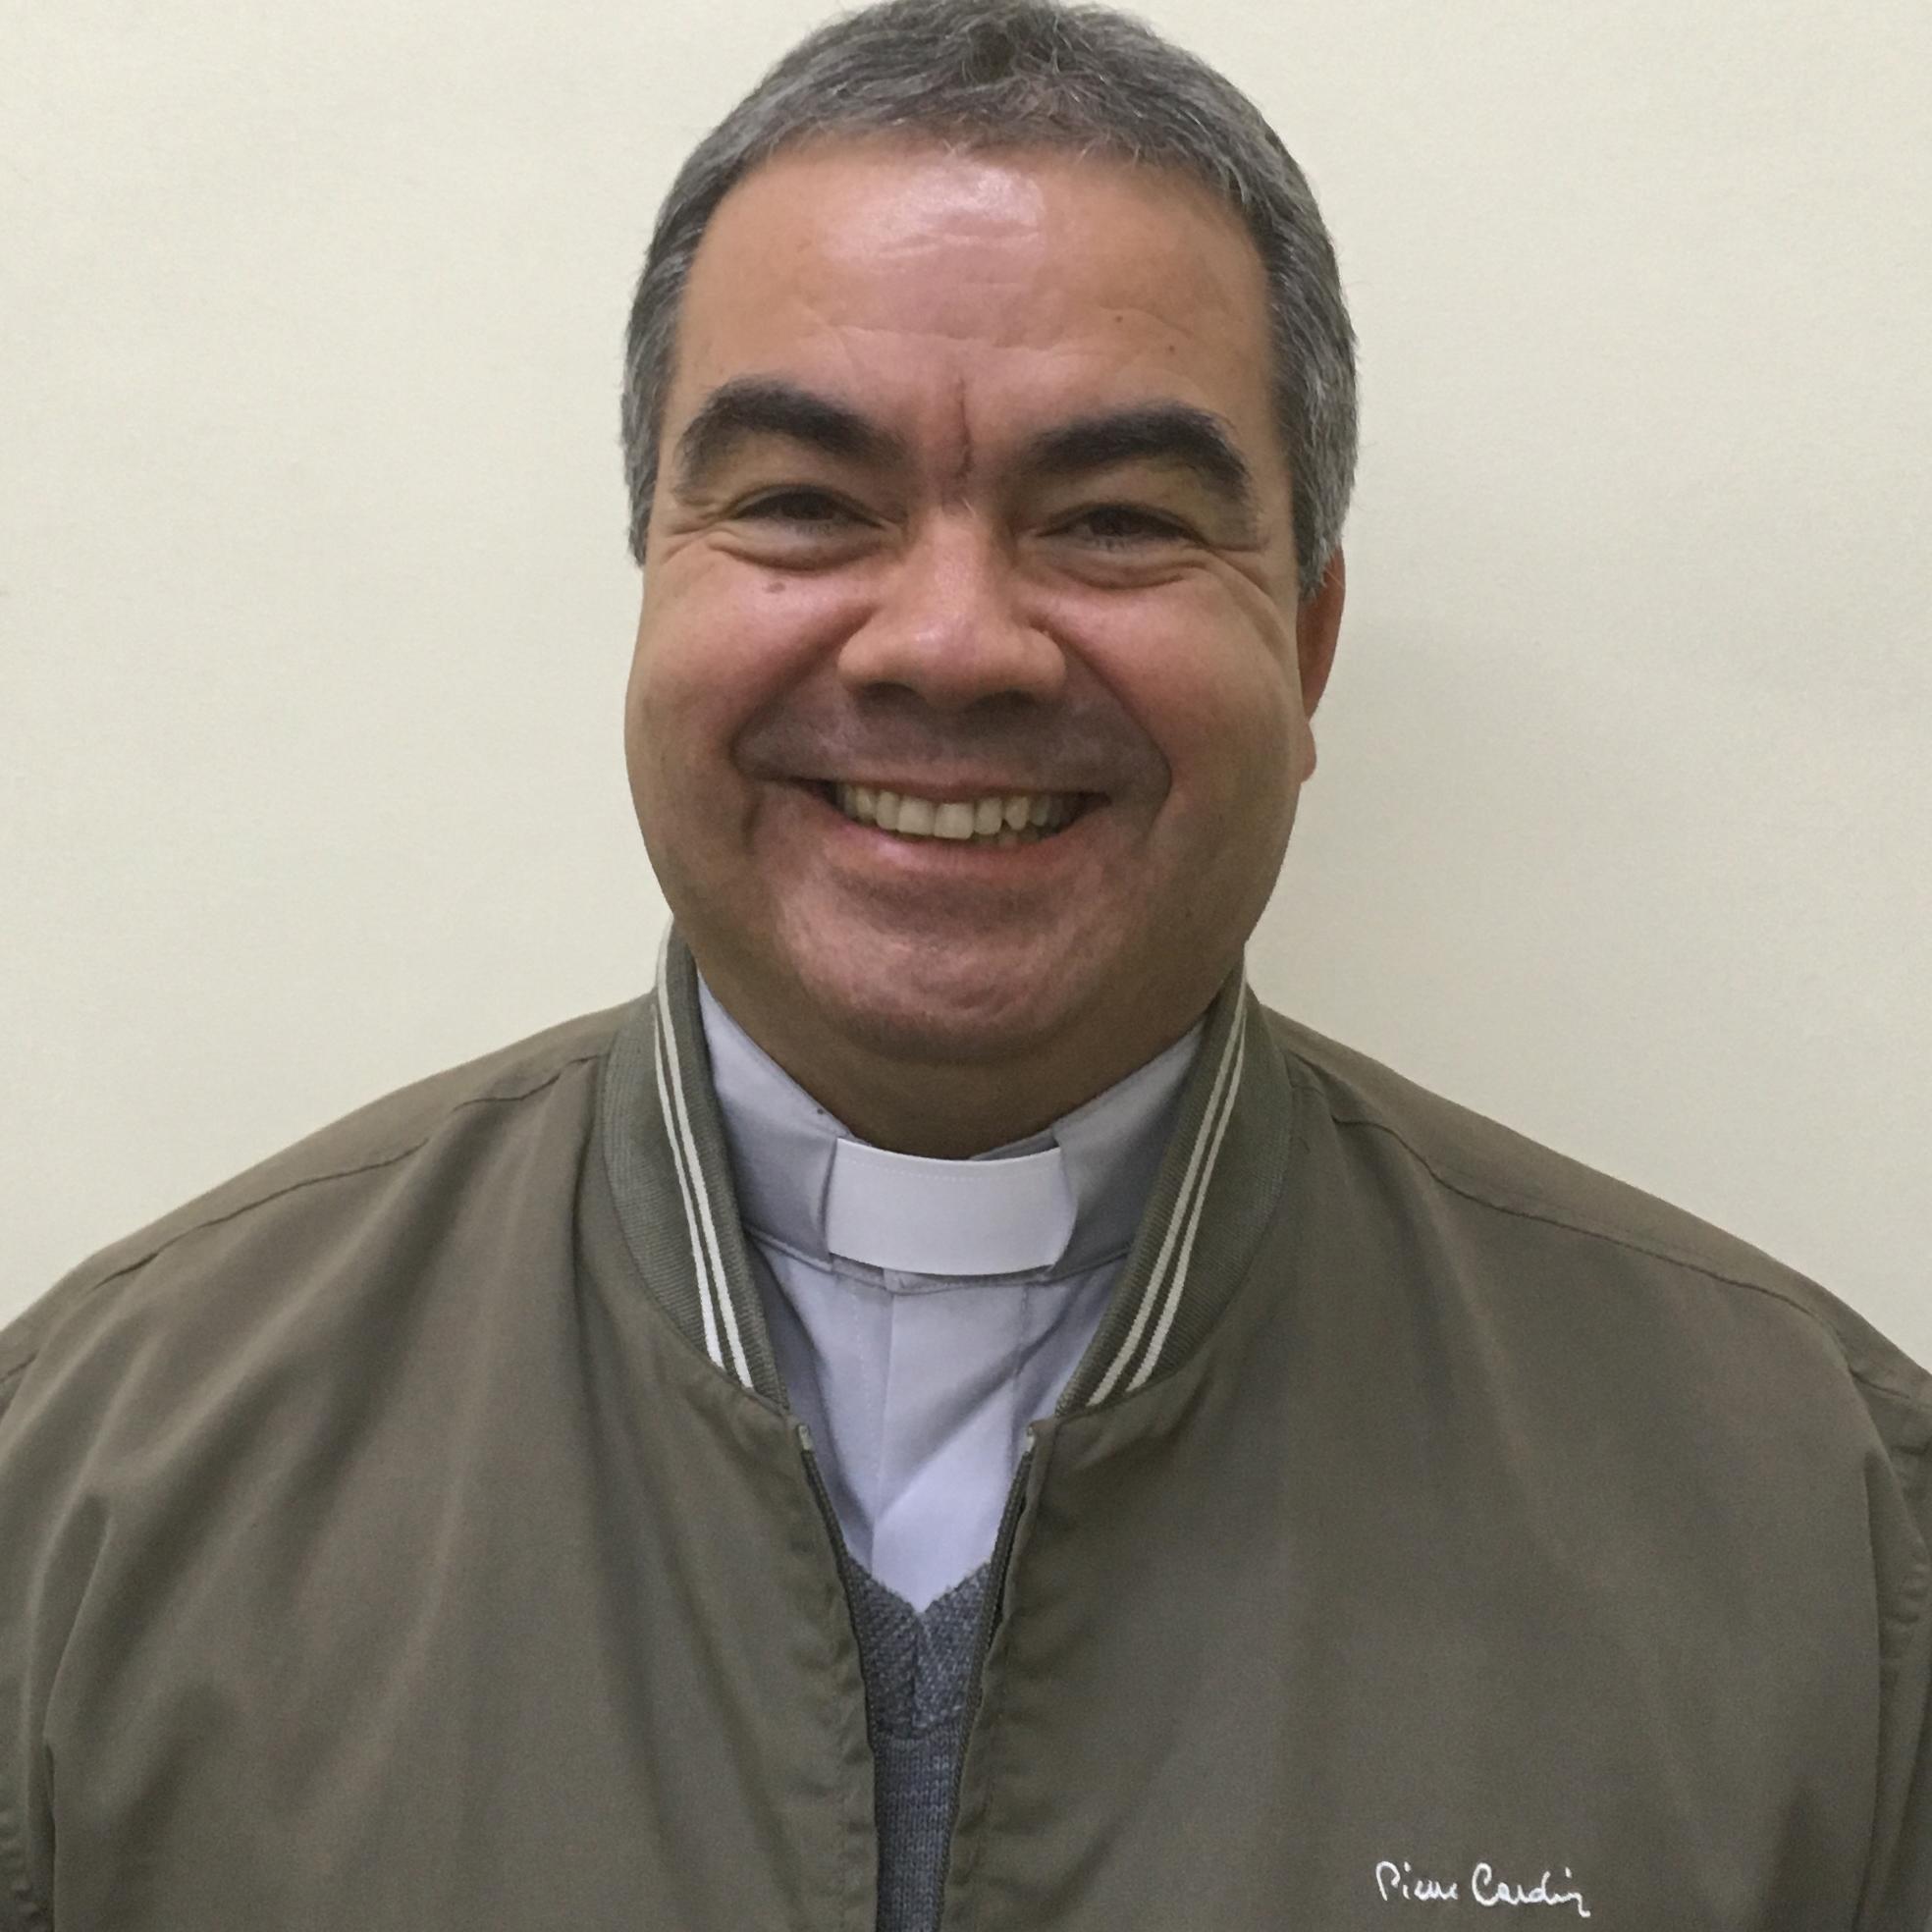 Prof. Me. Pe. Pedro Paulo de Carvalho Rosa